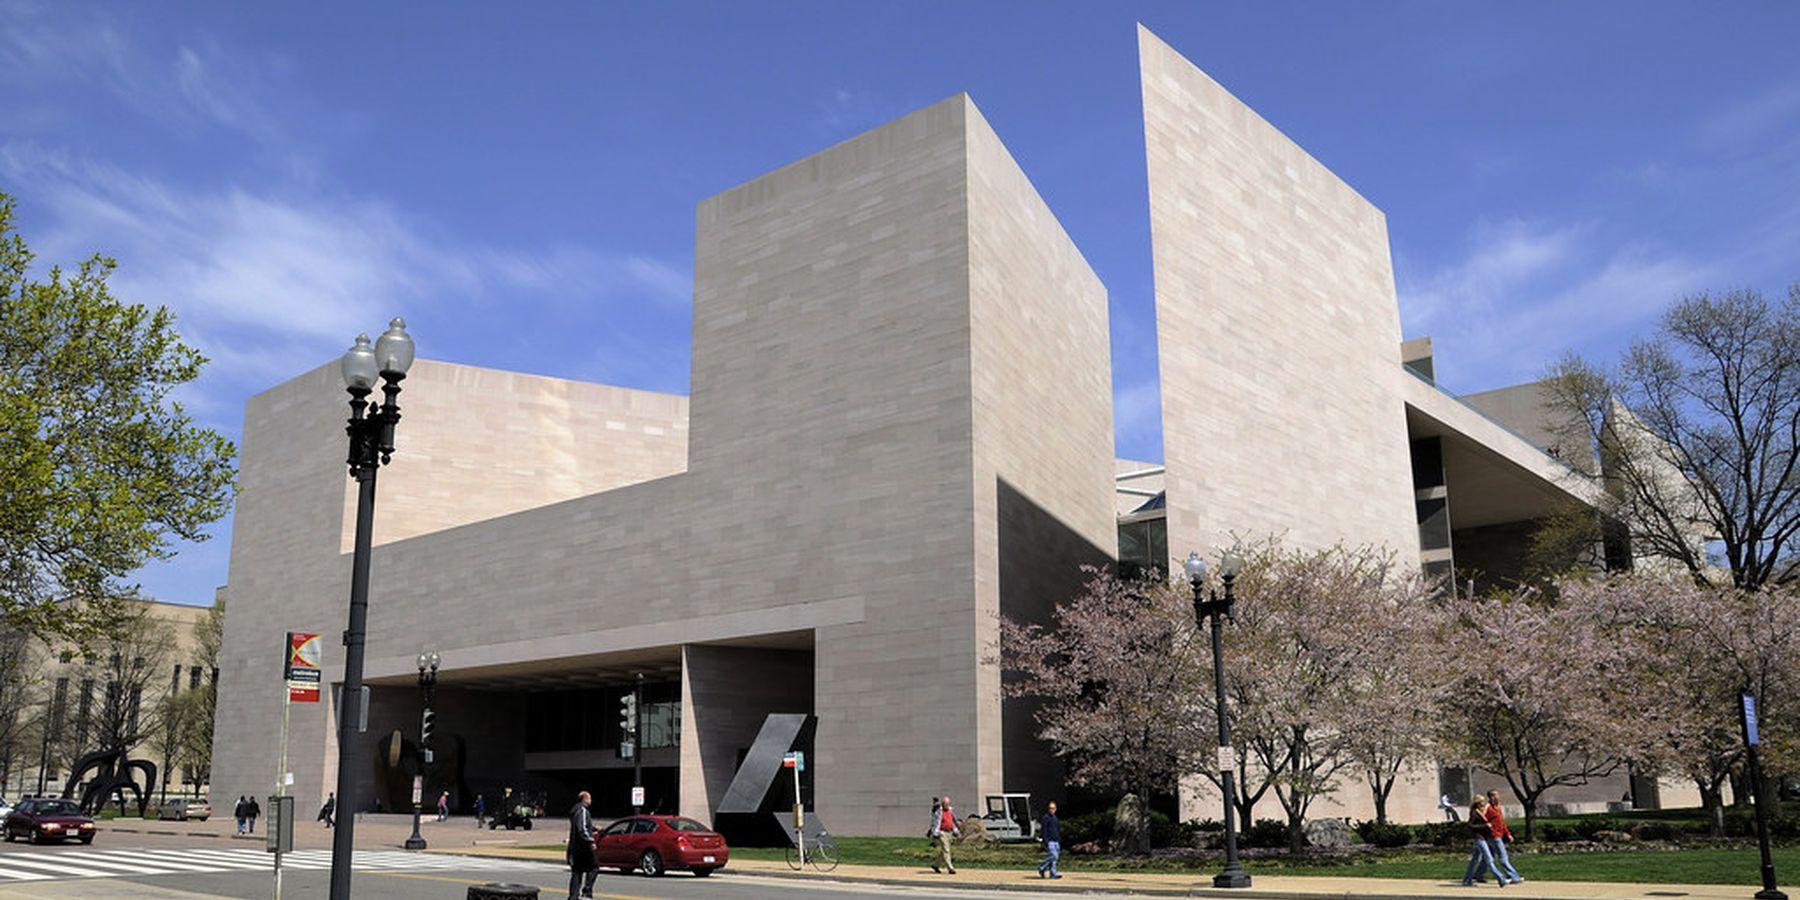 National Gallery of Art - Washington D.C. - Doets Reizen